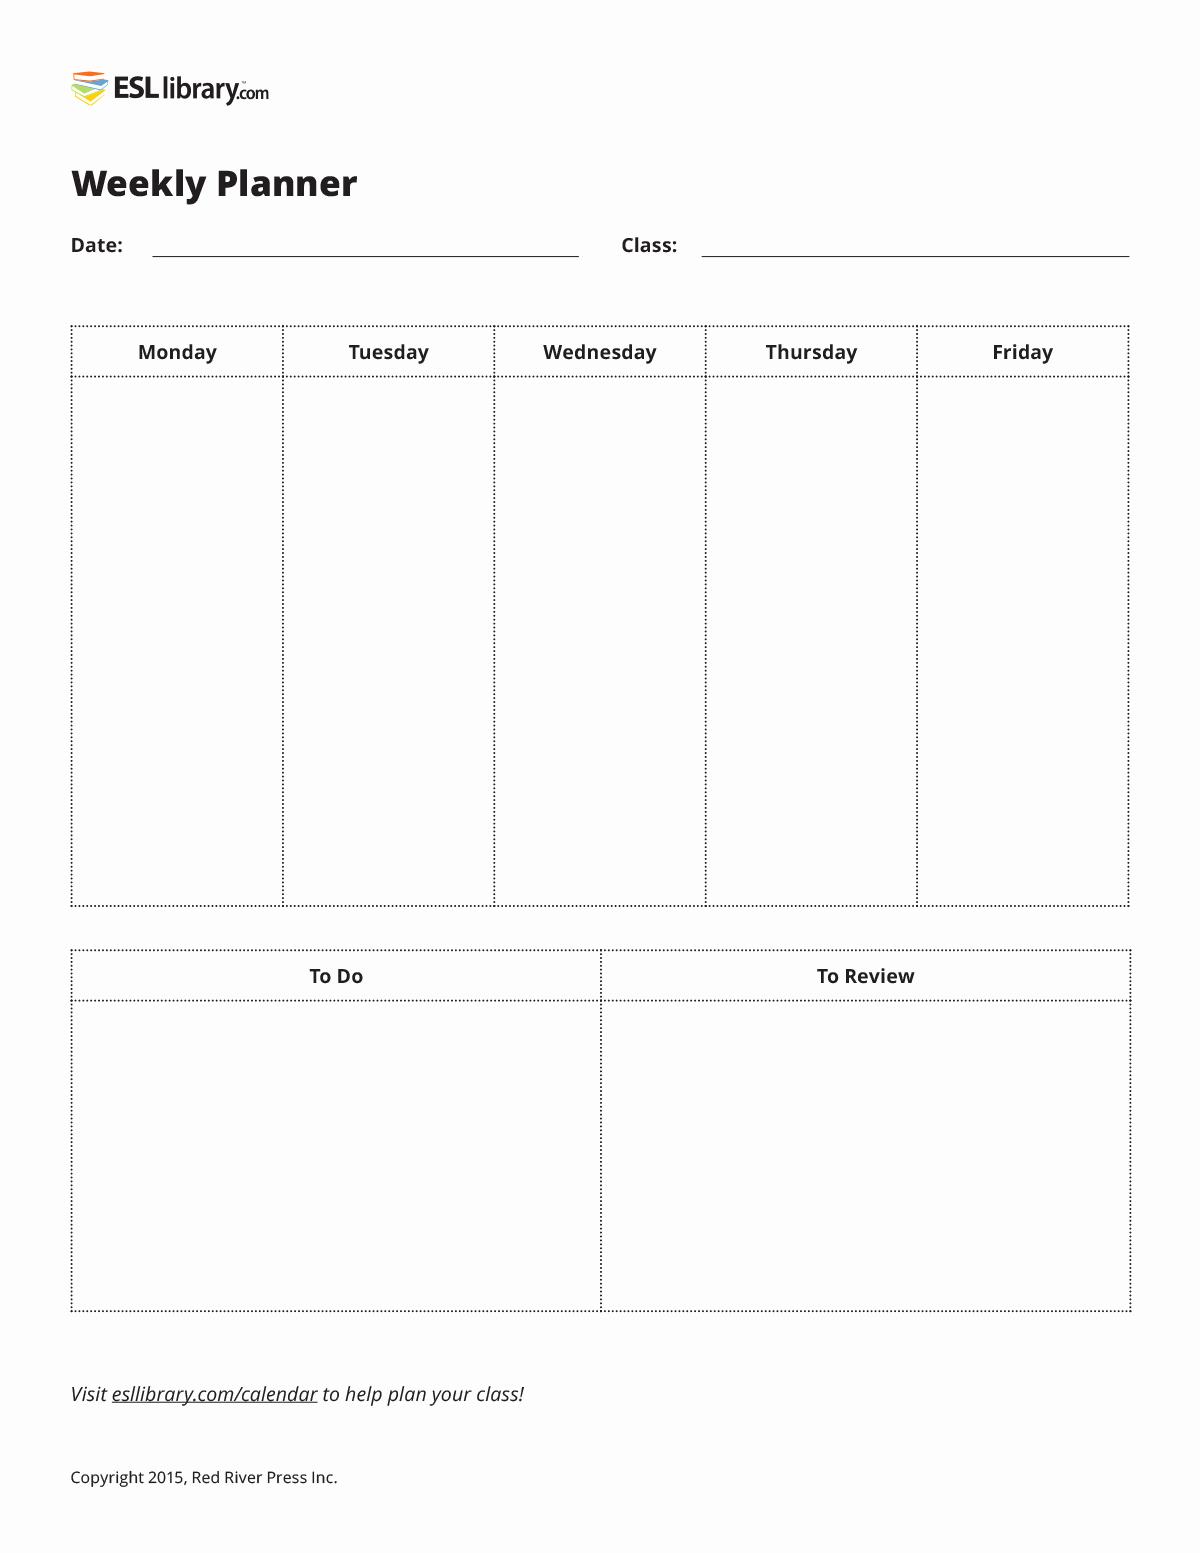 Weekly Planner Template for Teachers Elegant Lesson Planning tools & Tips for Teachers – Esl Library Blog